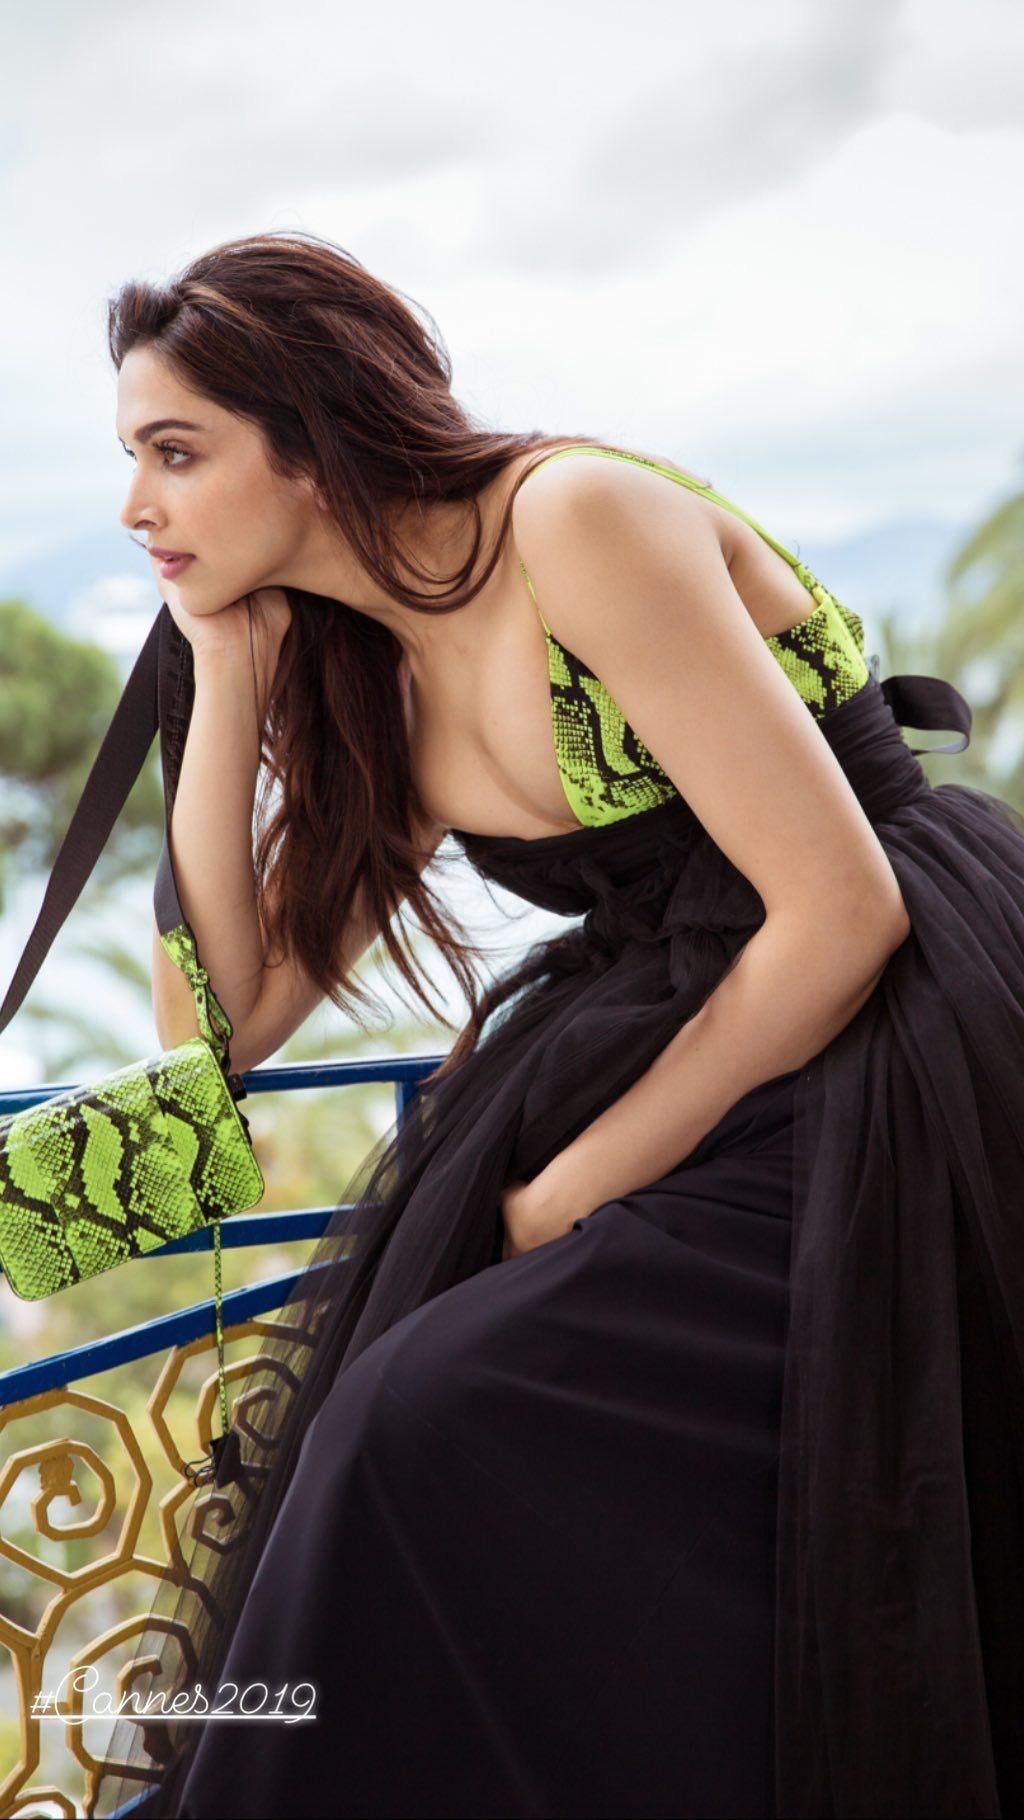 Deepika Padukone Biography Age Height Net Worth Family Movies Buzzzfly Bollywood Celebrities Deepika Padukone Style Bollywood Actress Hot Photos